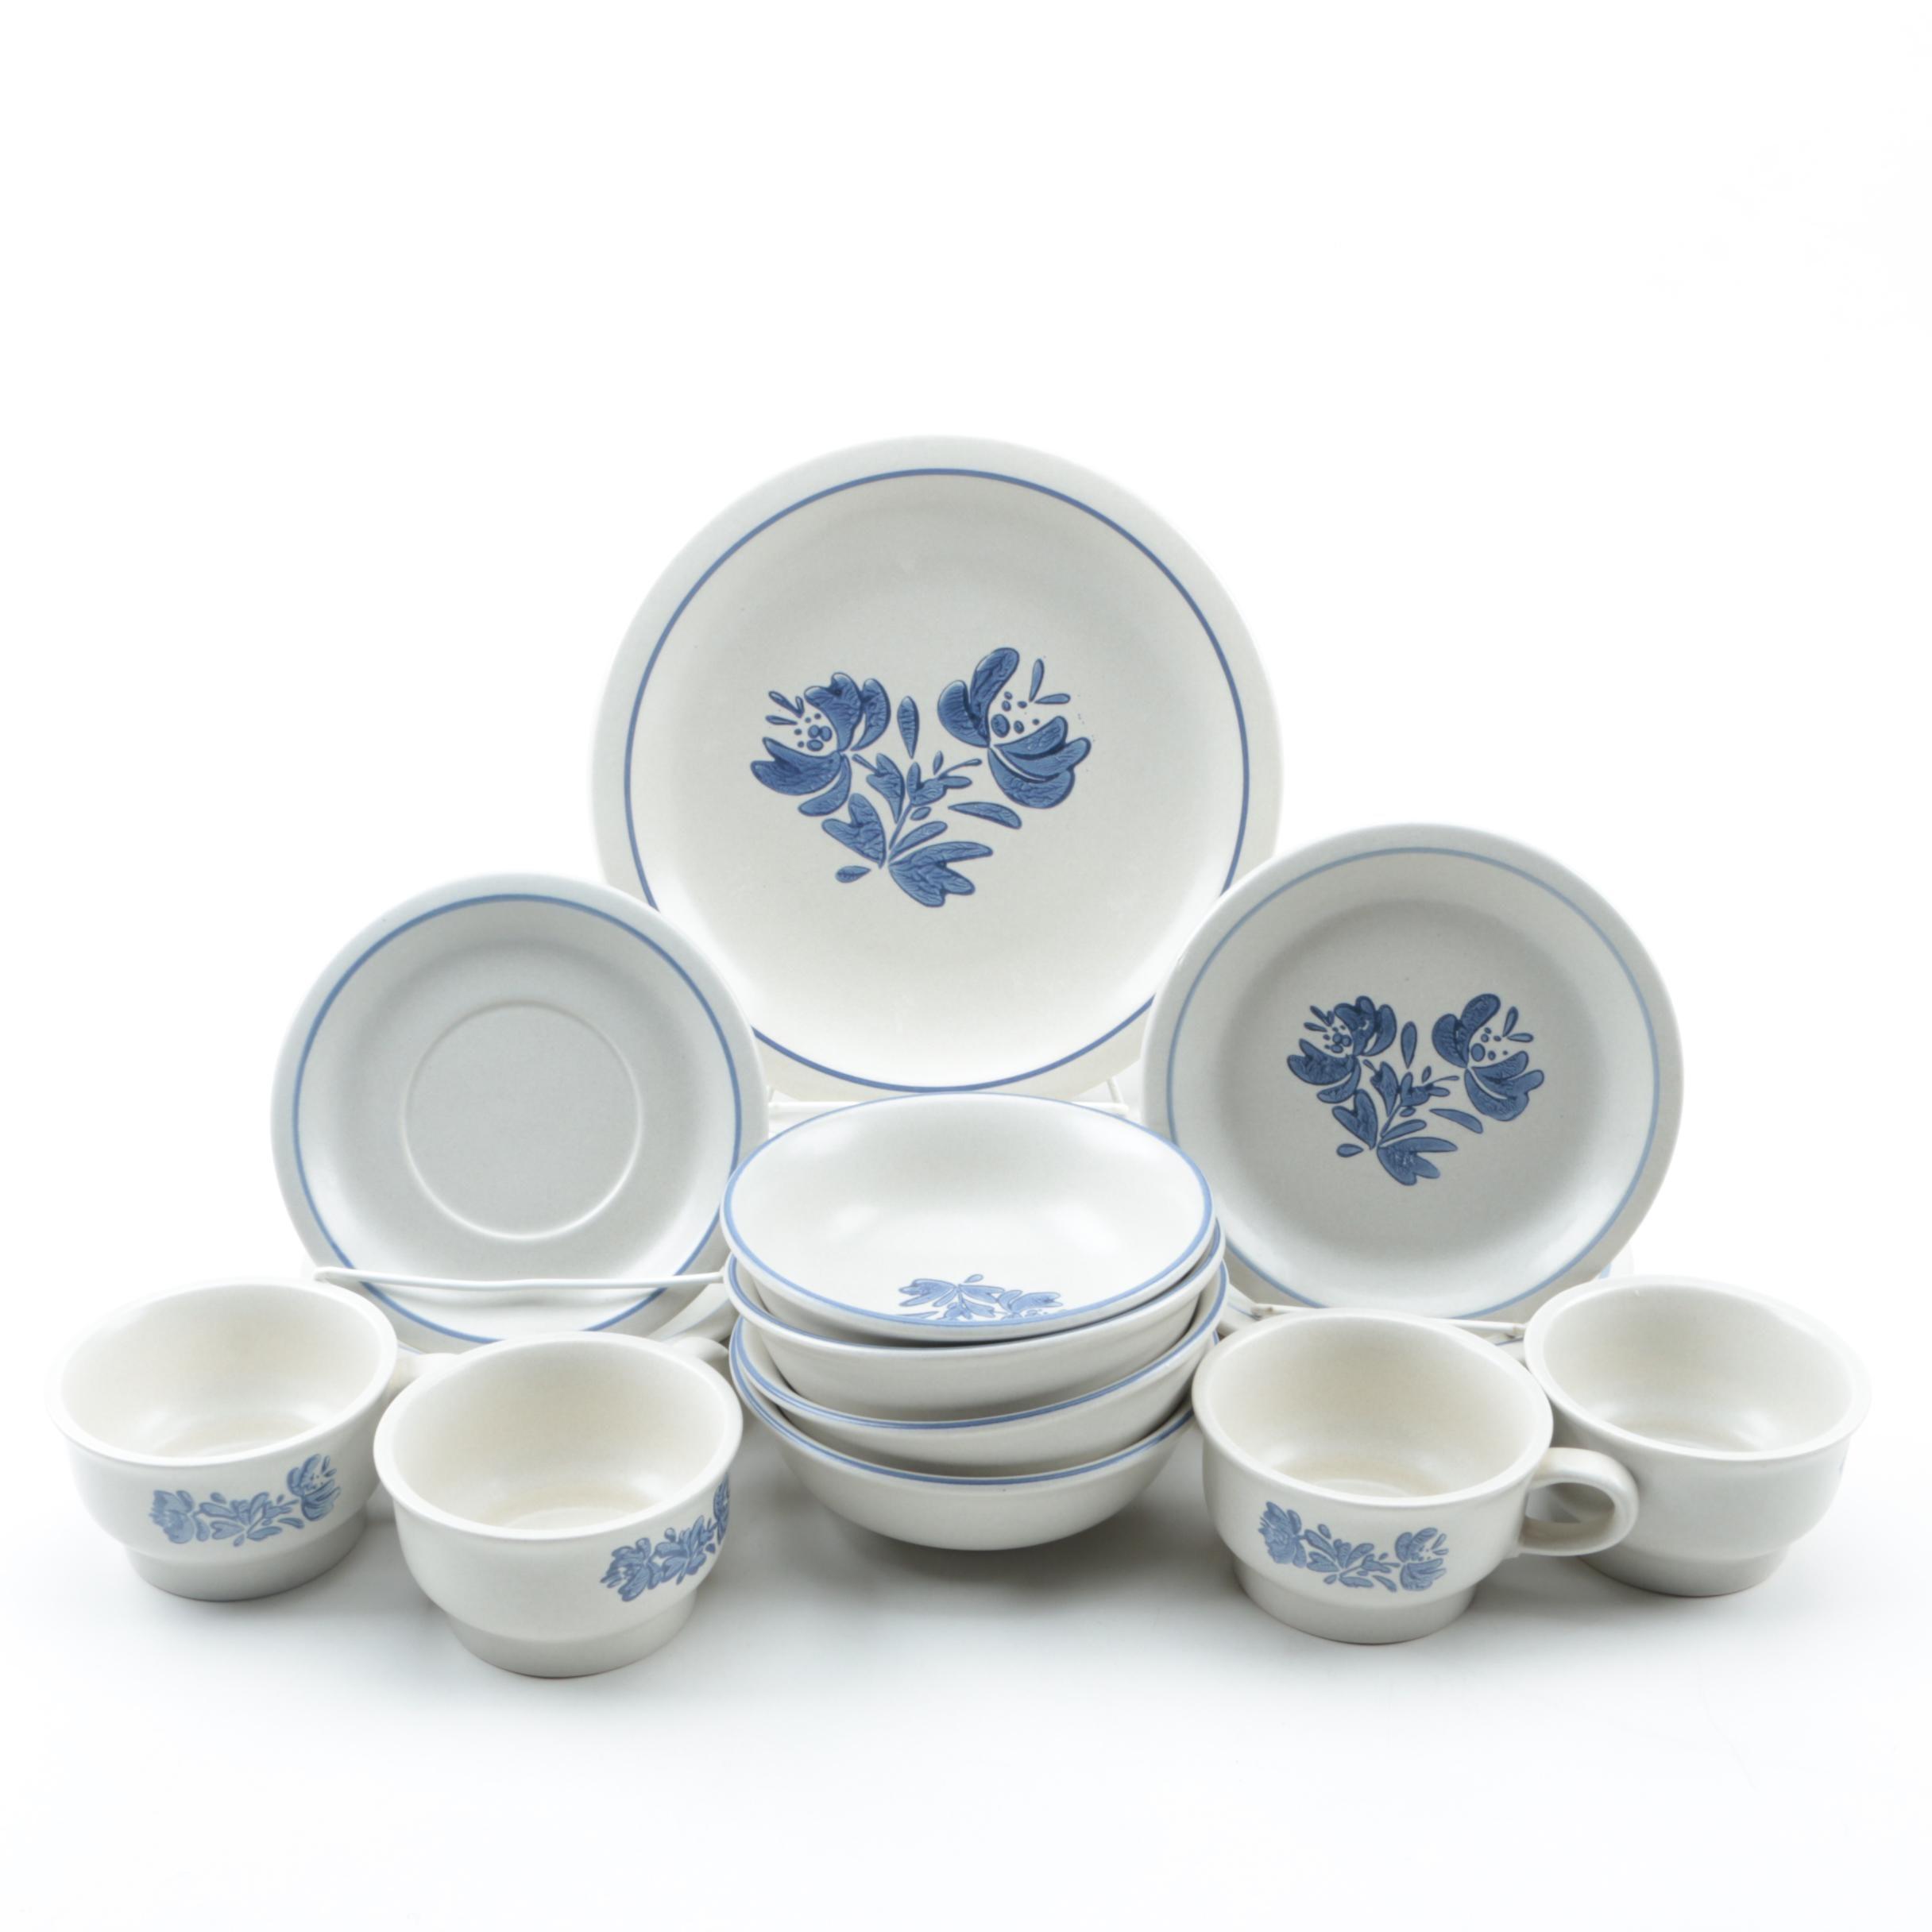 "Pfaltzgraff ""Yorktowne"" Stoneware Tableware"